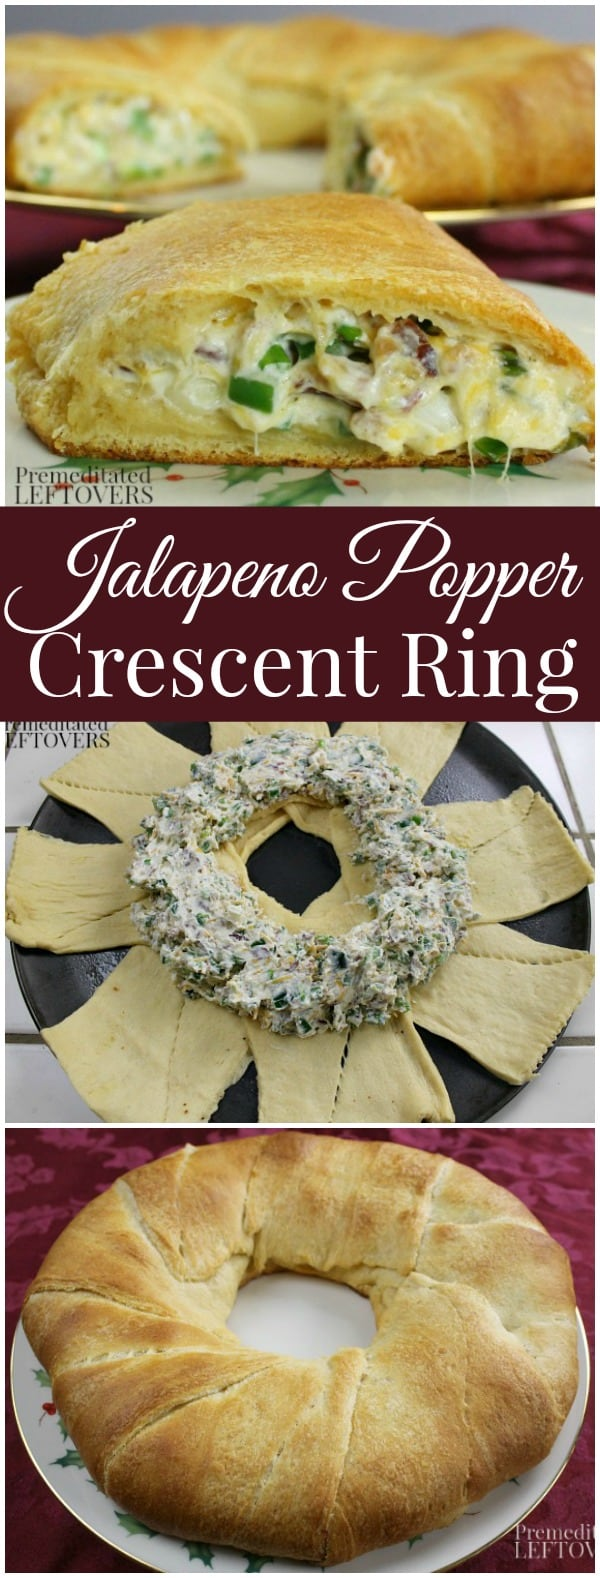 Easy Holiday Recipe - Jalapeno Popper Crescent Ring Recipe